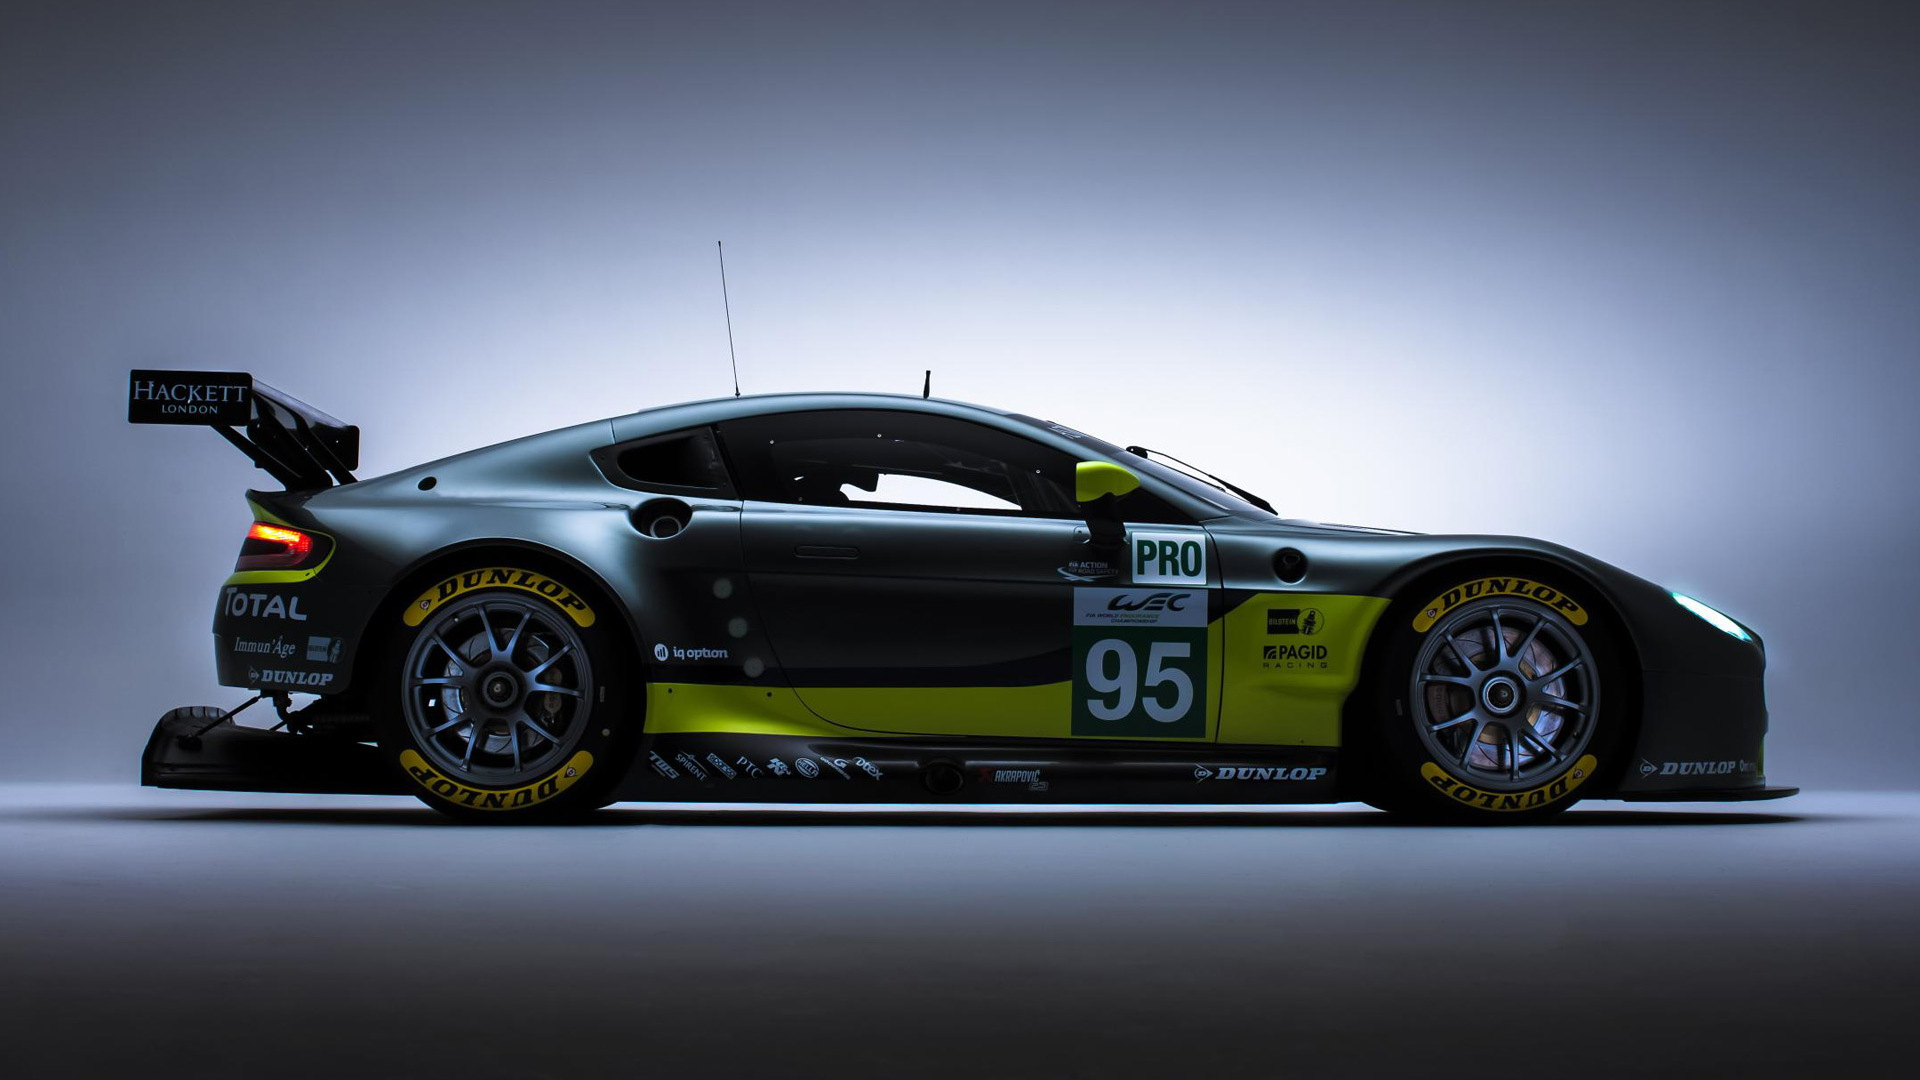 2016 Aston Martin Vantage GTE race car